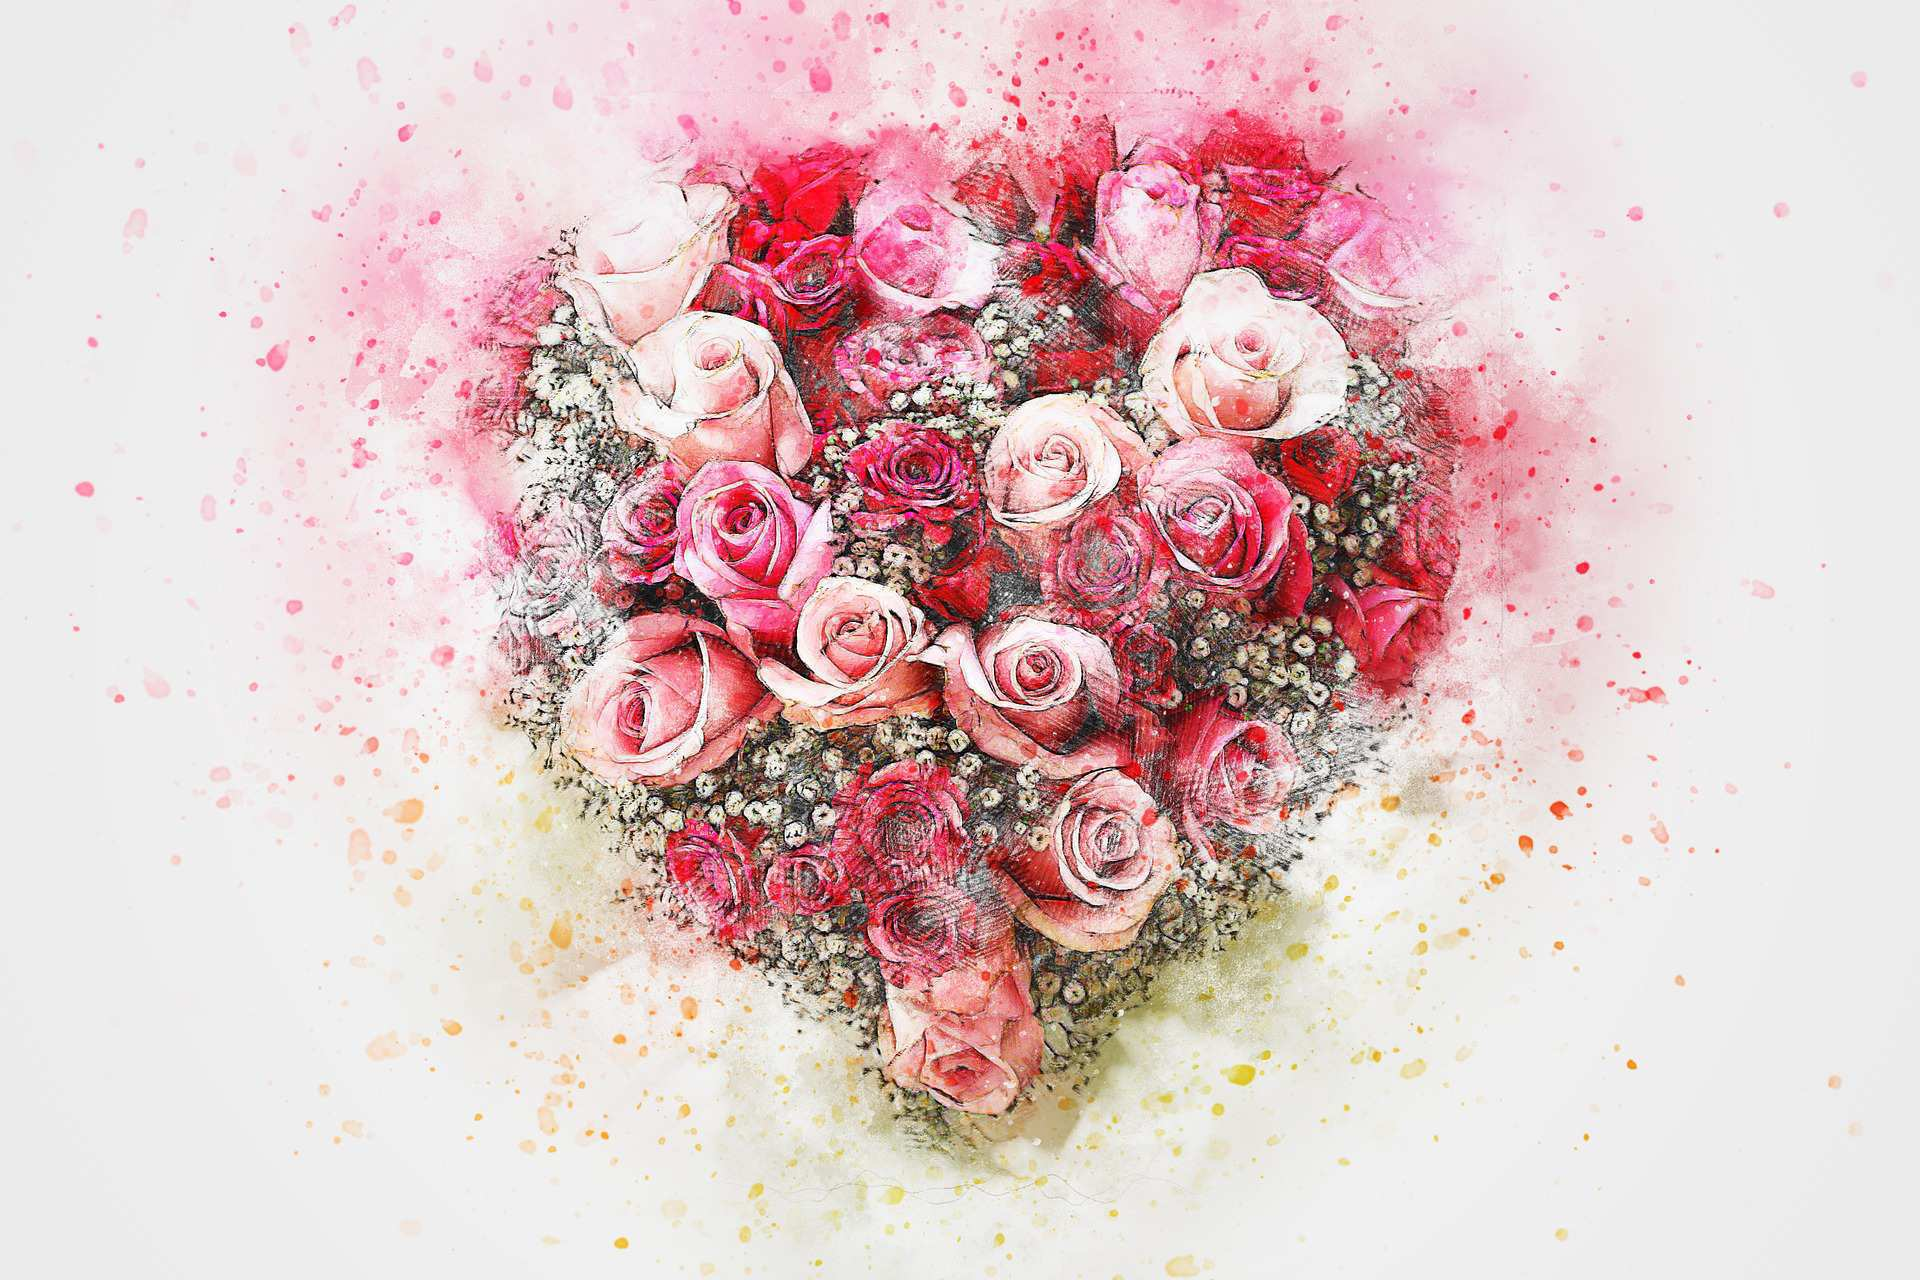 Contoh Lukisan Bunga Mawar Indah Jual Poster Di Juragan Poster